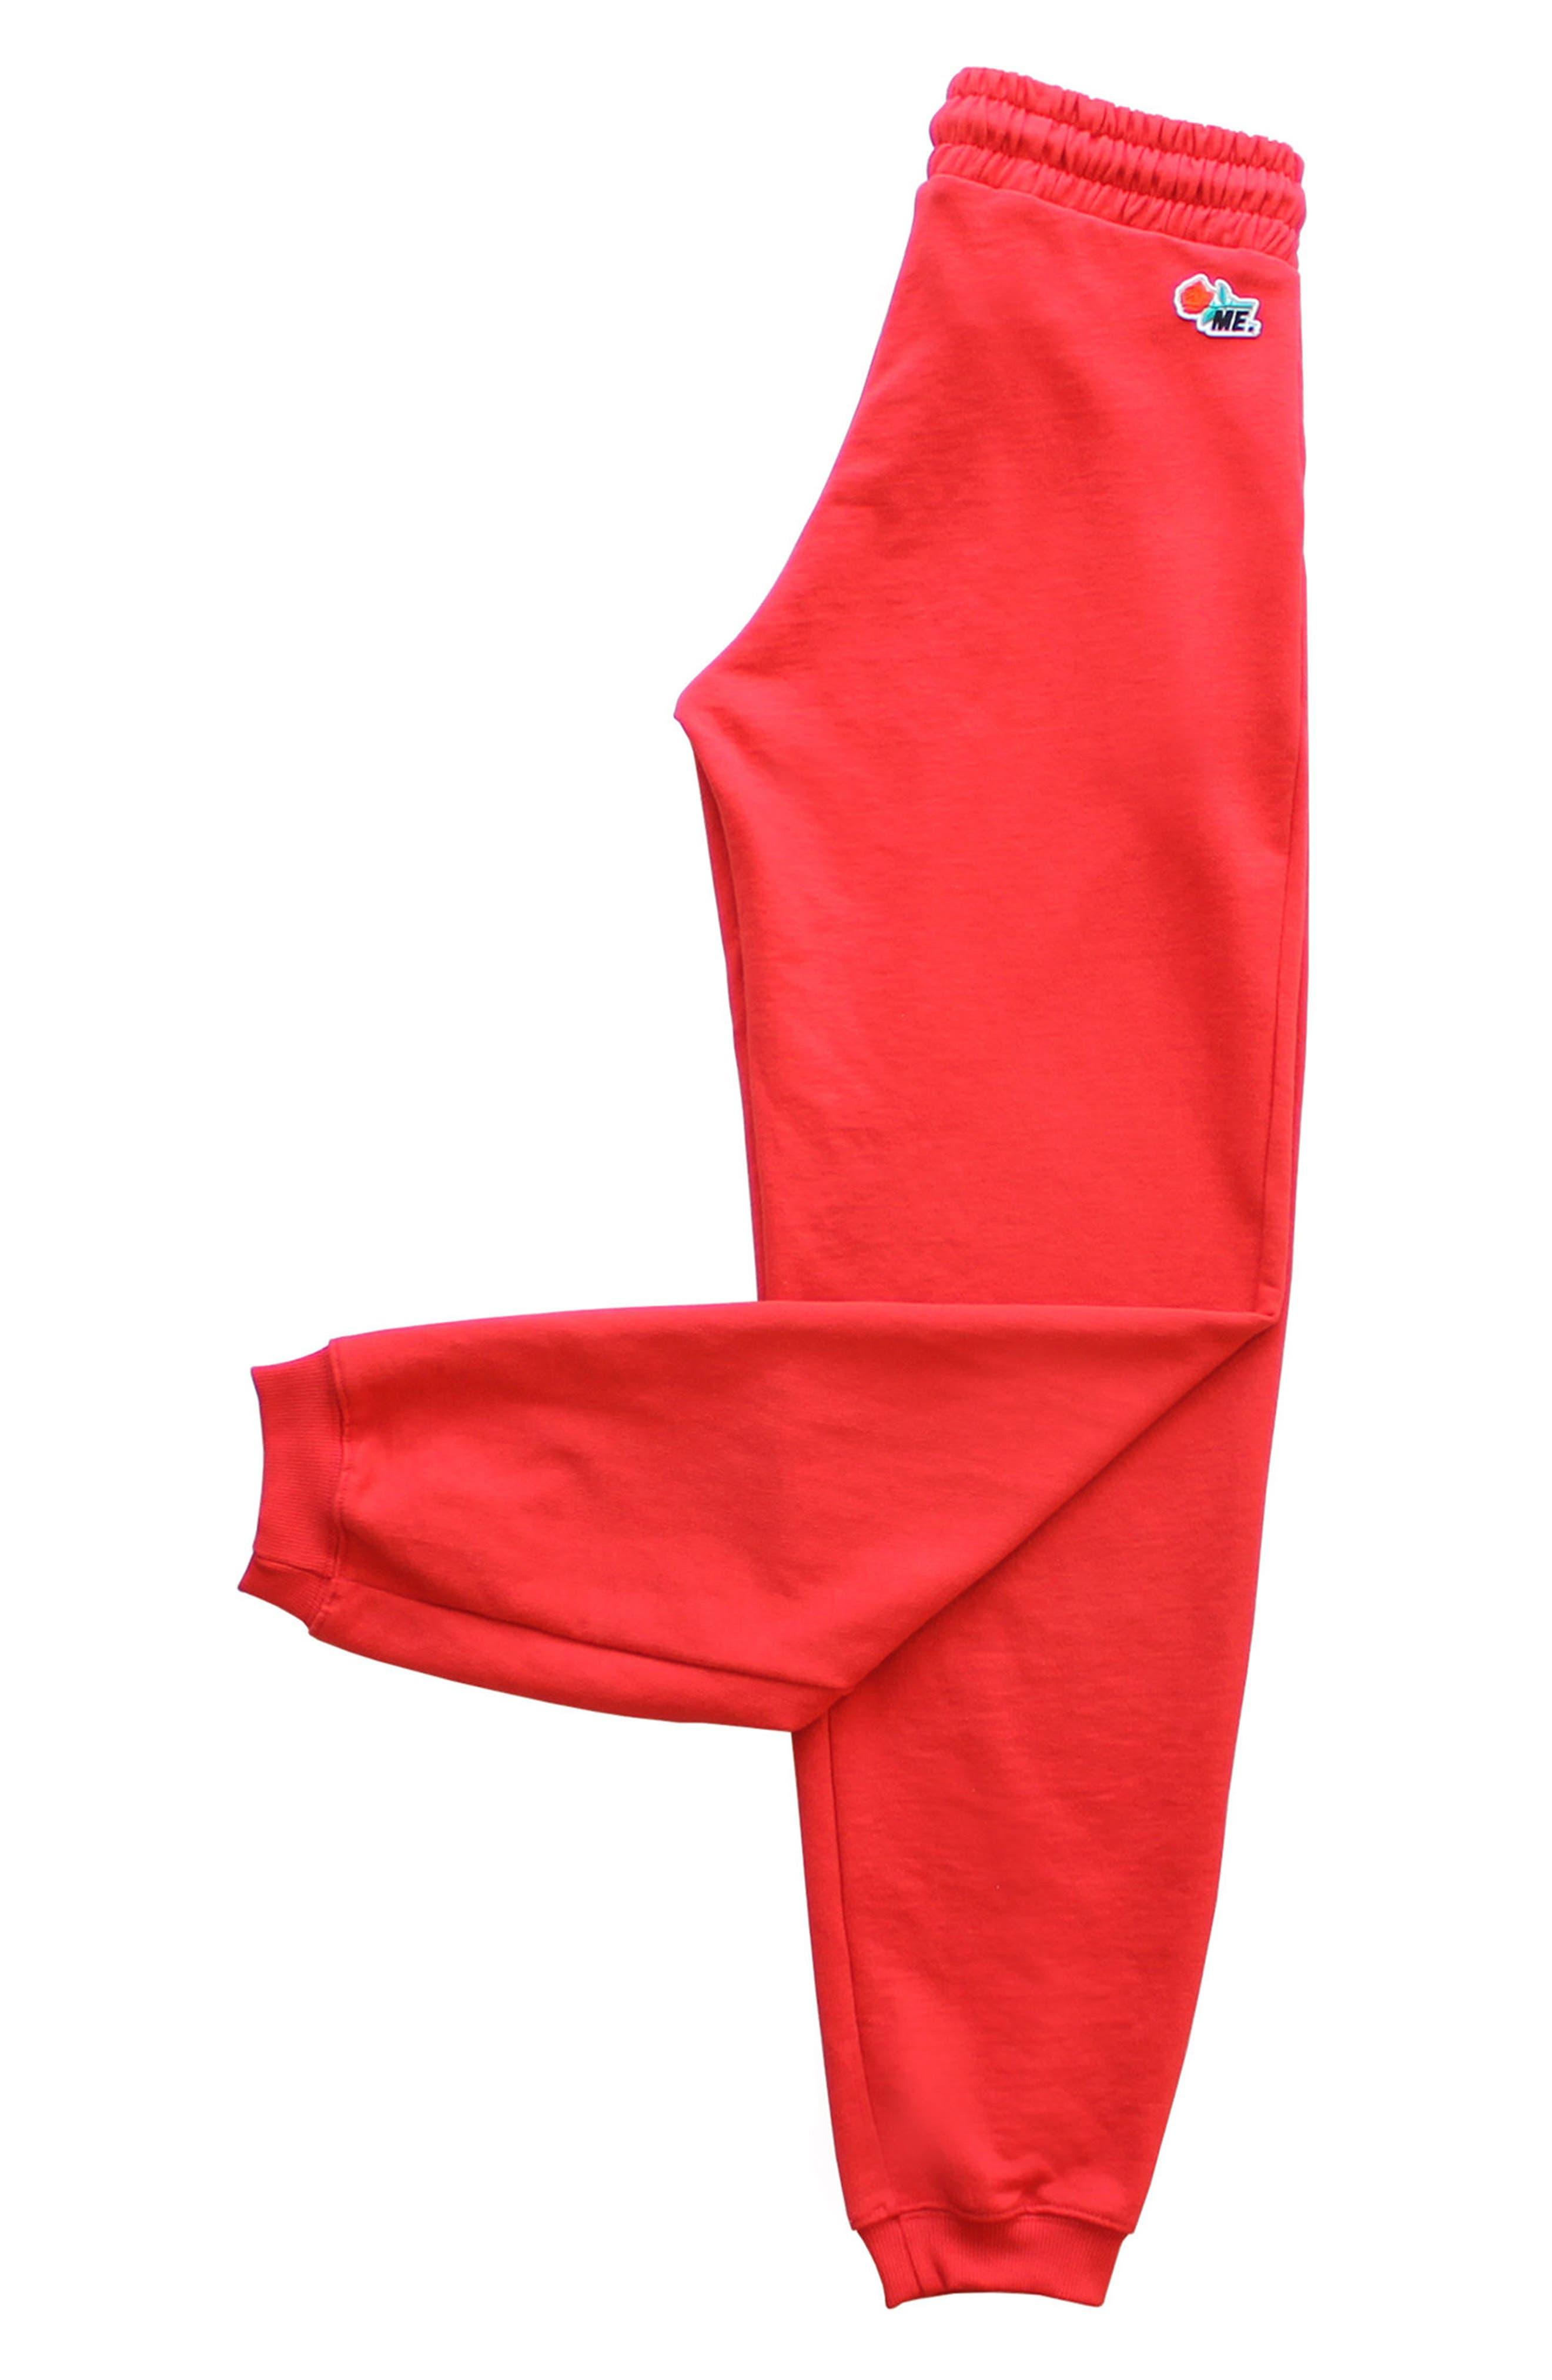 ME. Rose Sweatpants,                             Alternate thumbnail 9, color,                             CHERRY RED